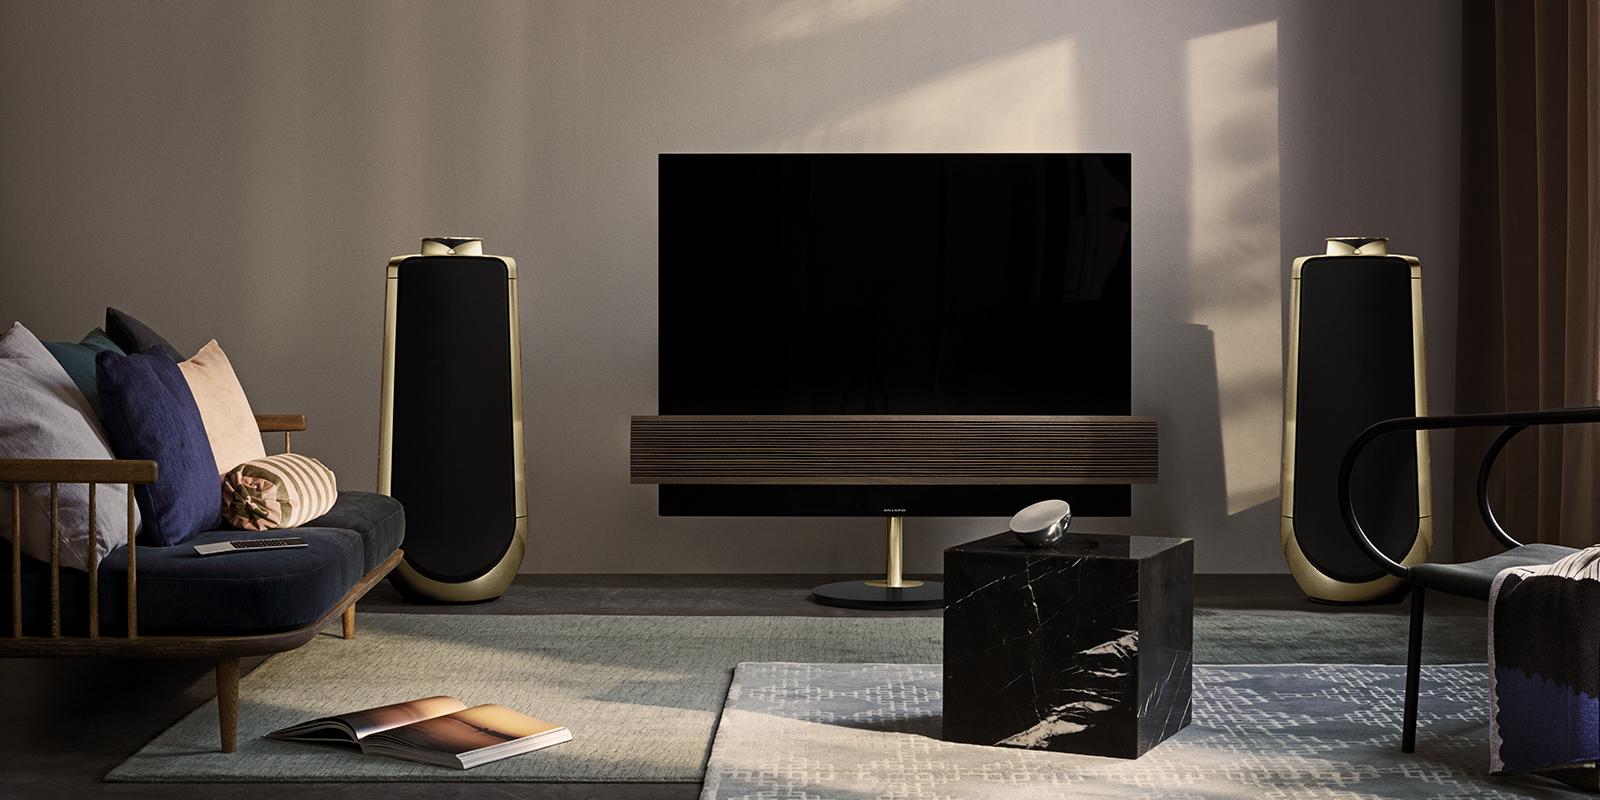 bang&olufsen eclipse tv en Brass Tone Speaker